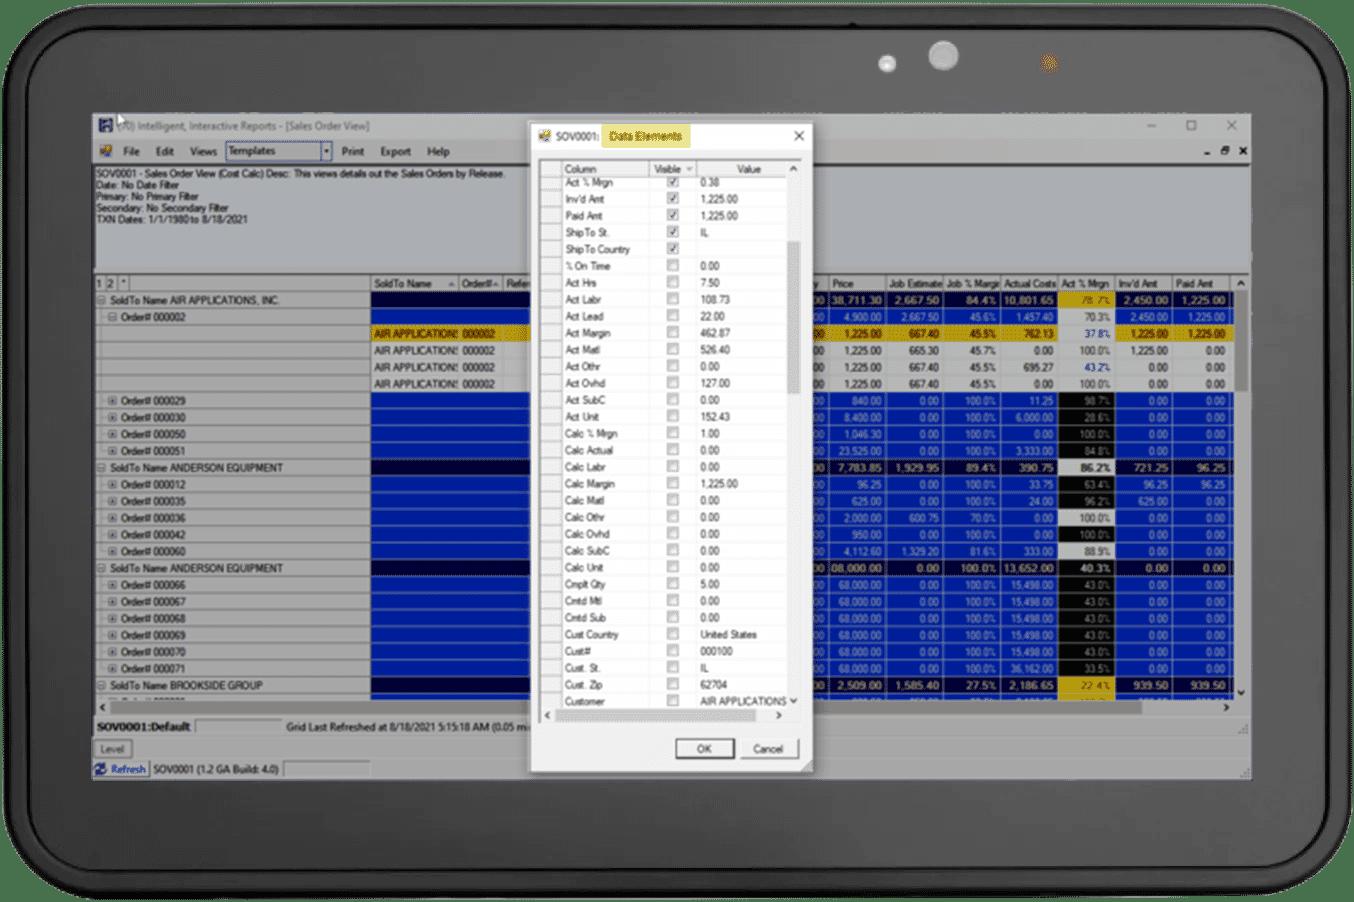 700 pre-configured data elements